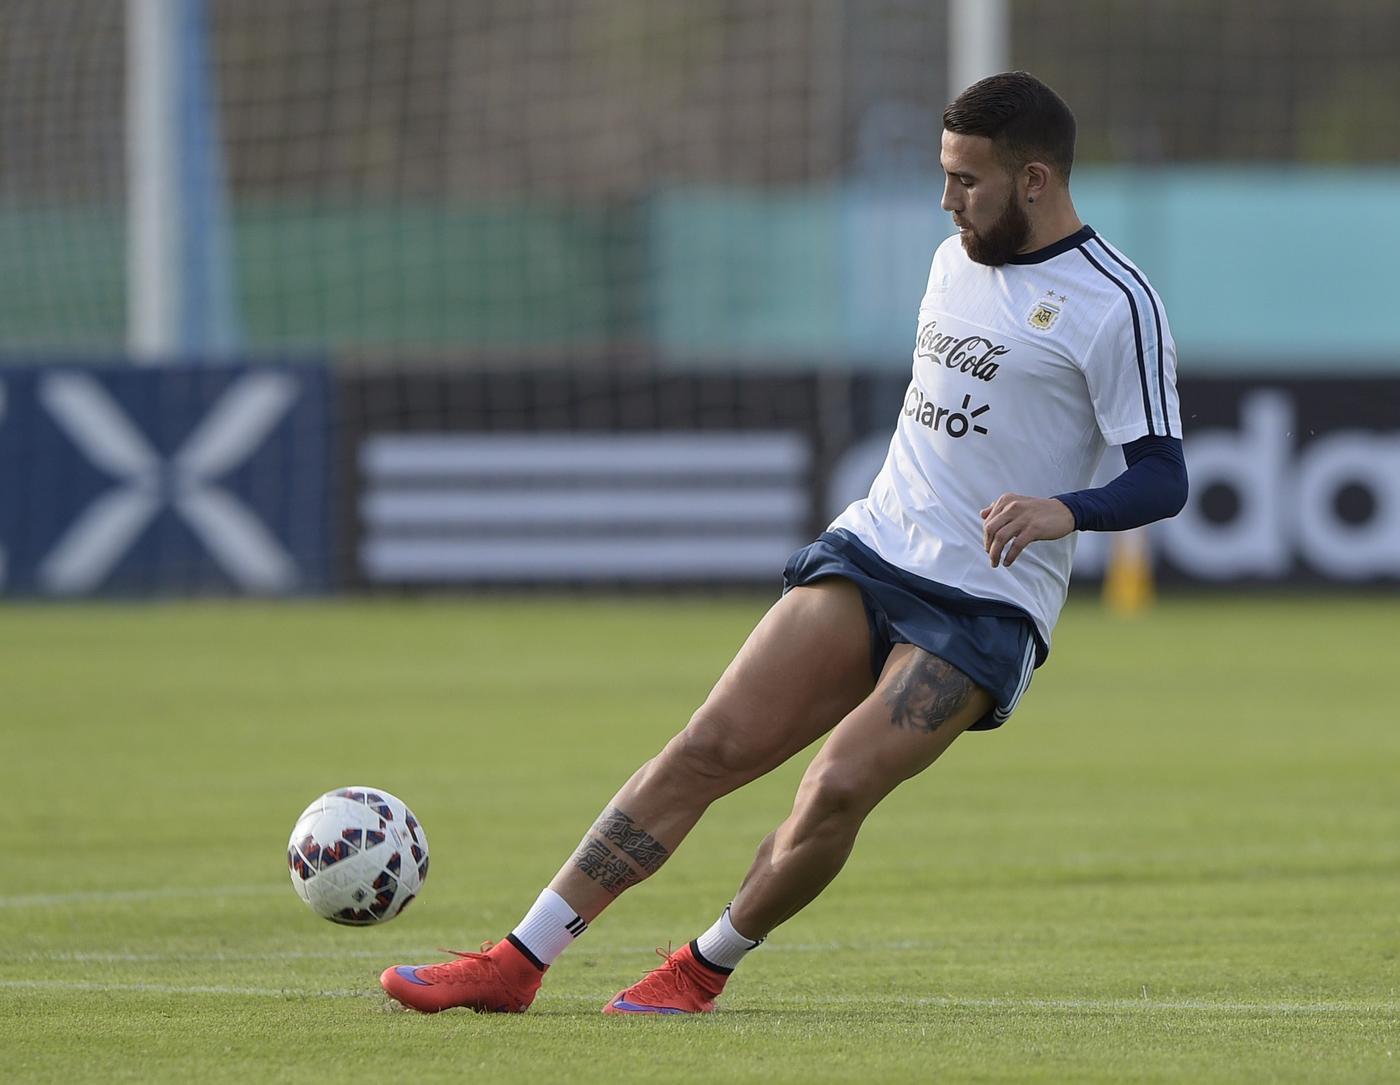 Manchester United 'scrap transfer negotiations with Valencia, will meet Nicolas Otamendi's £36.1m release clause'